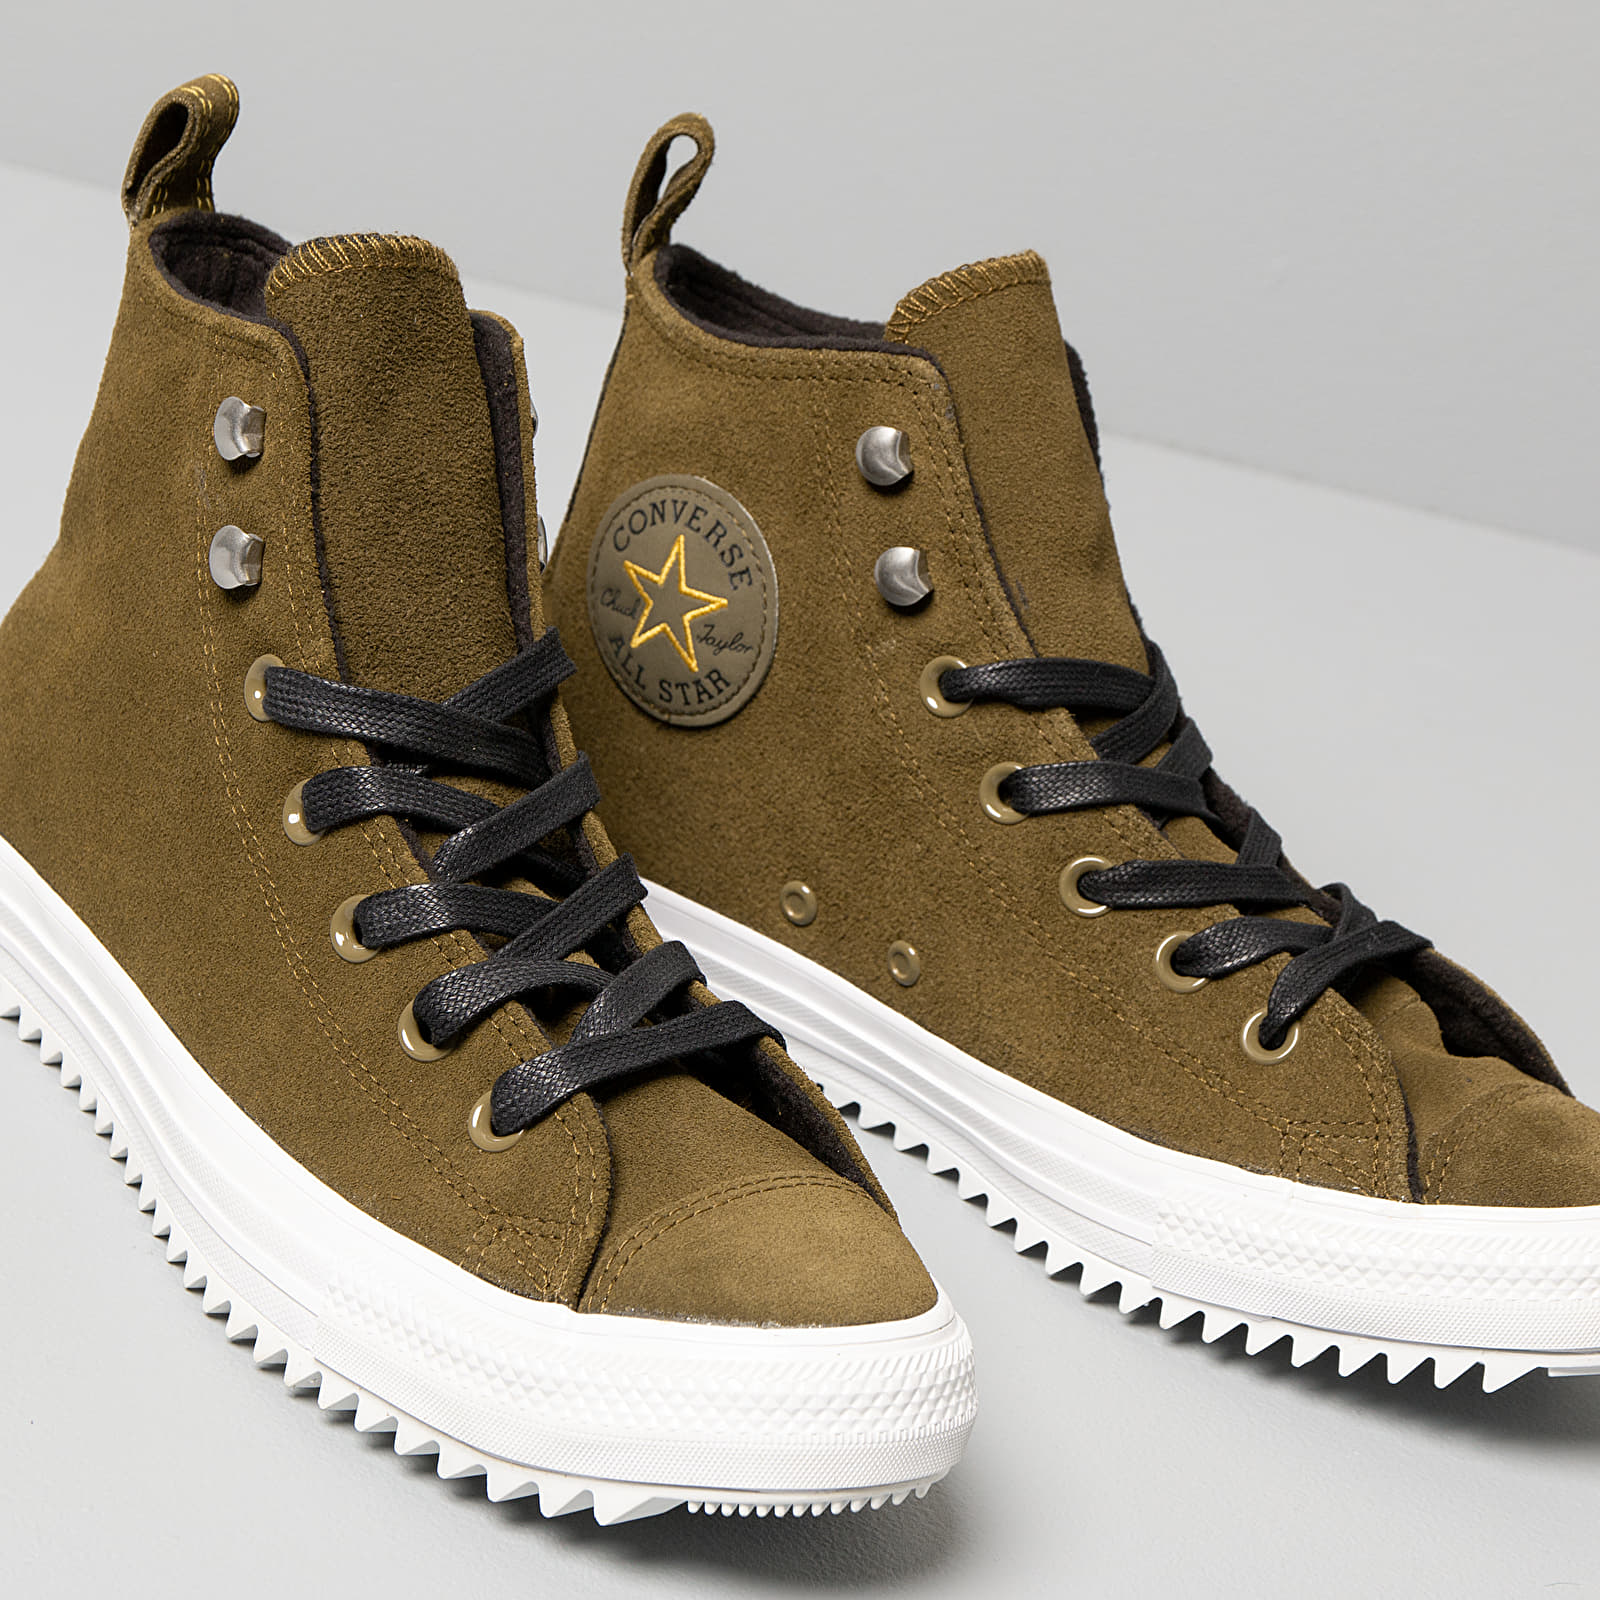 Converse Chuck Taylor All Star Hiker Final Frontier Surplus Olive/ White/  Black   Footshop